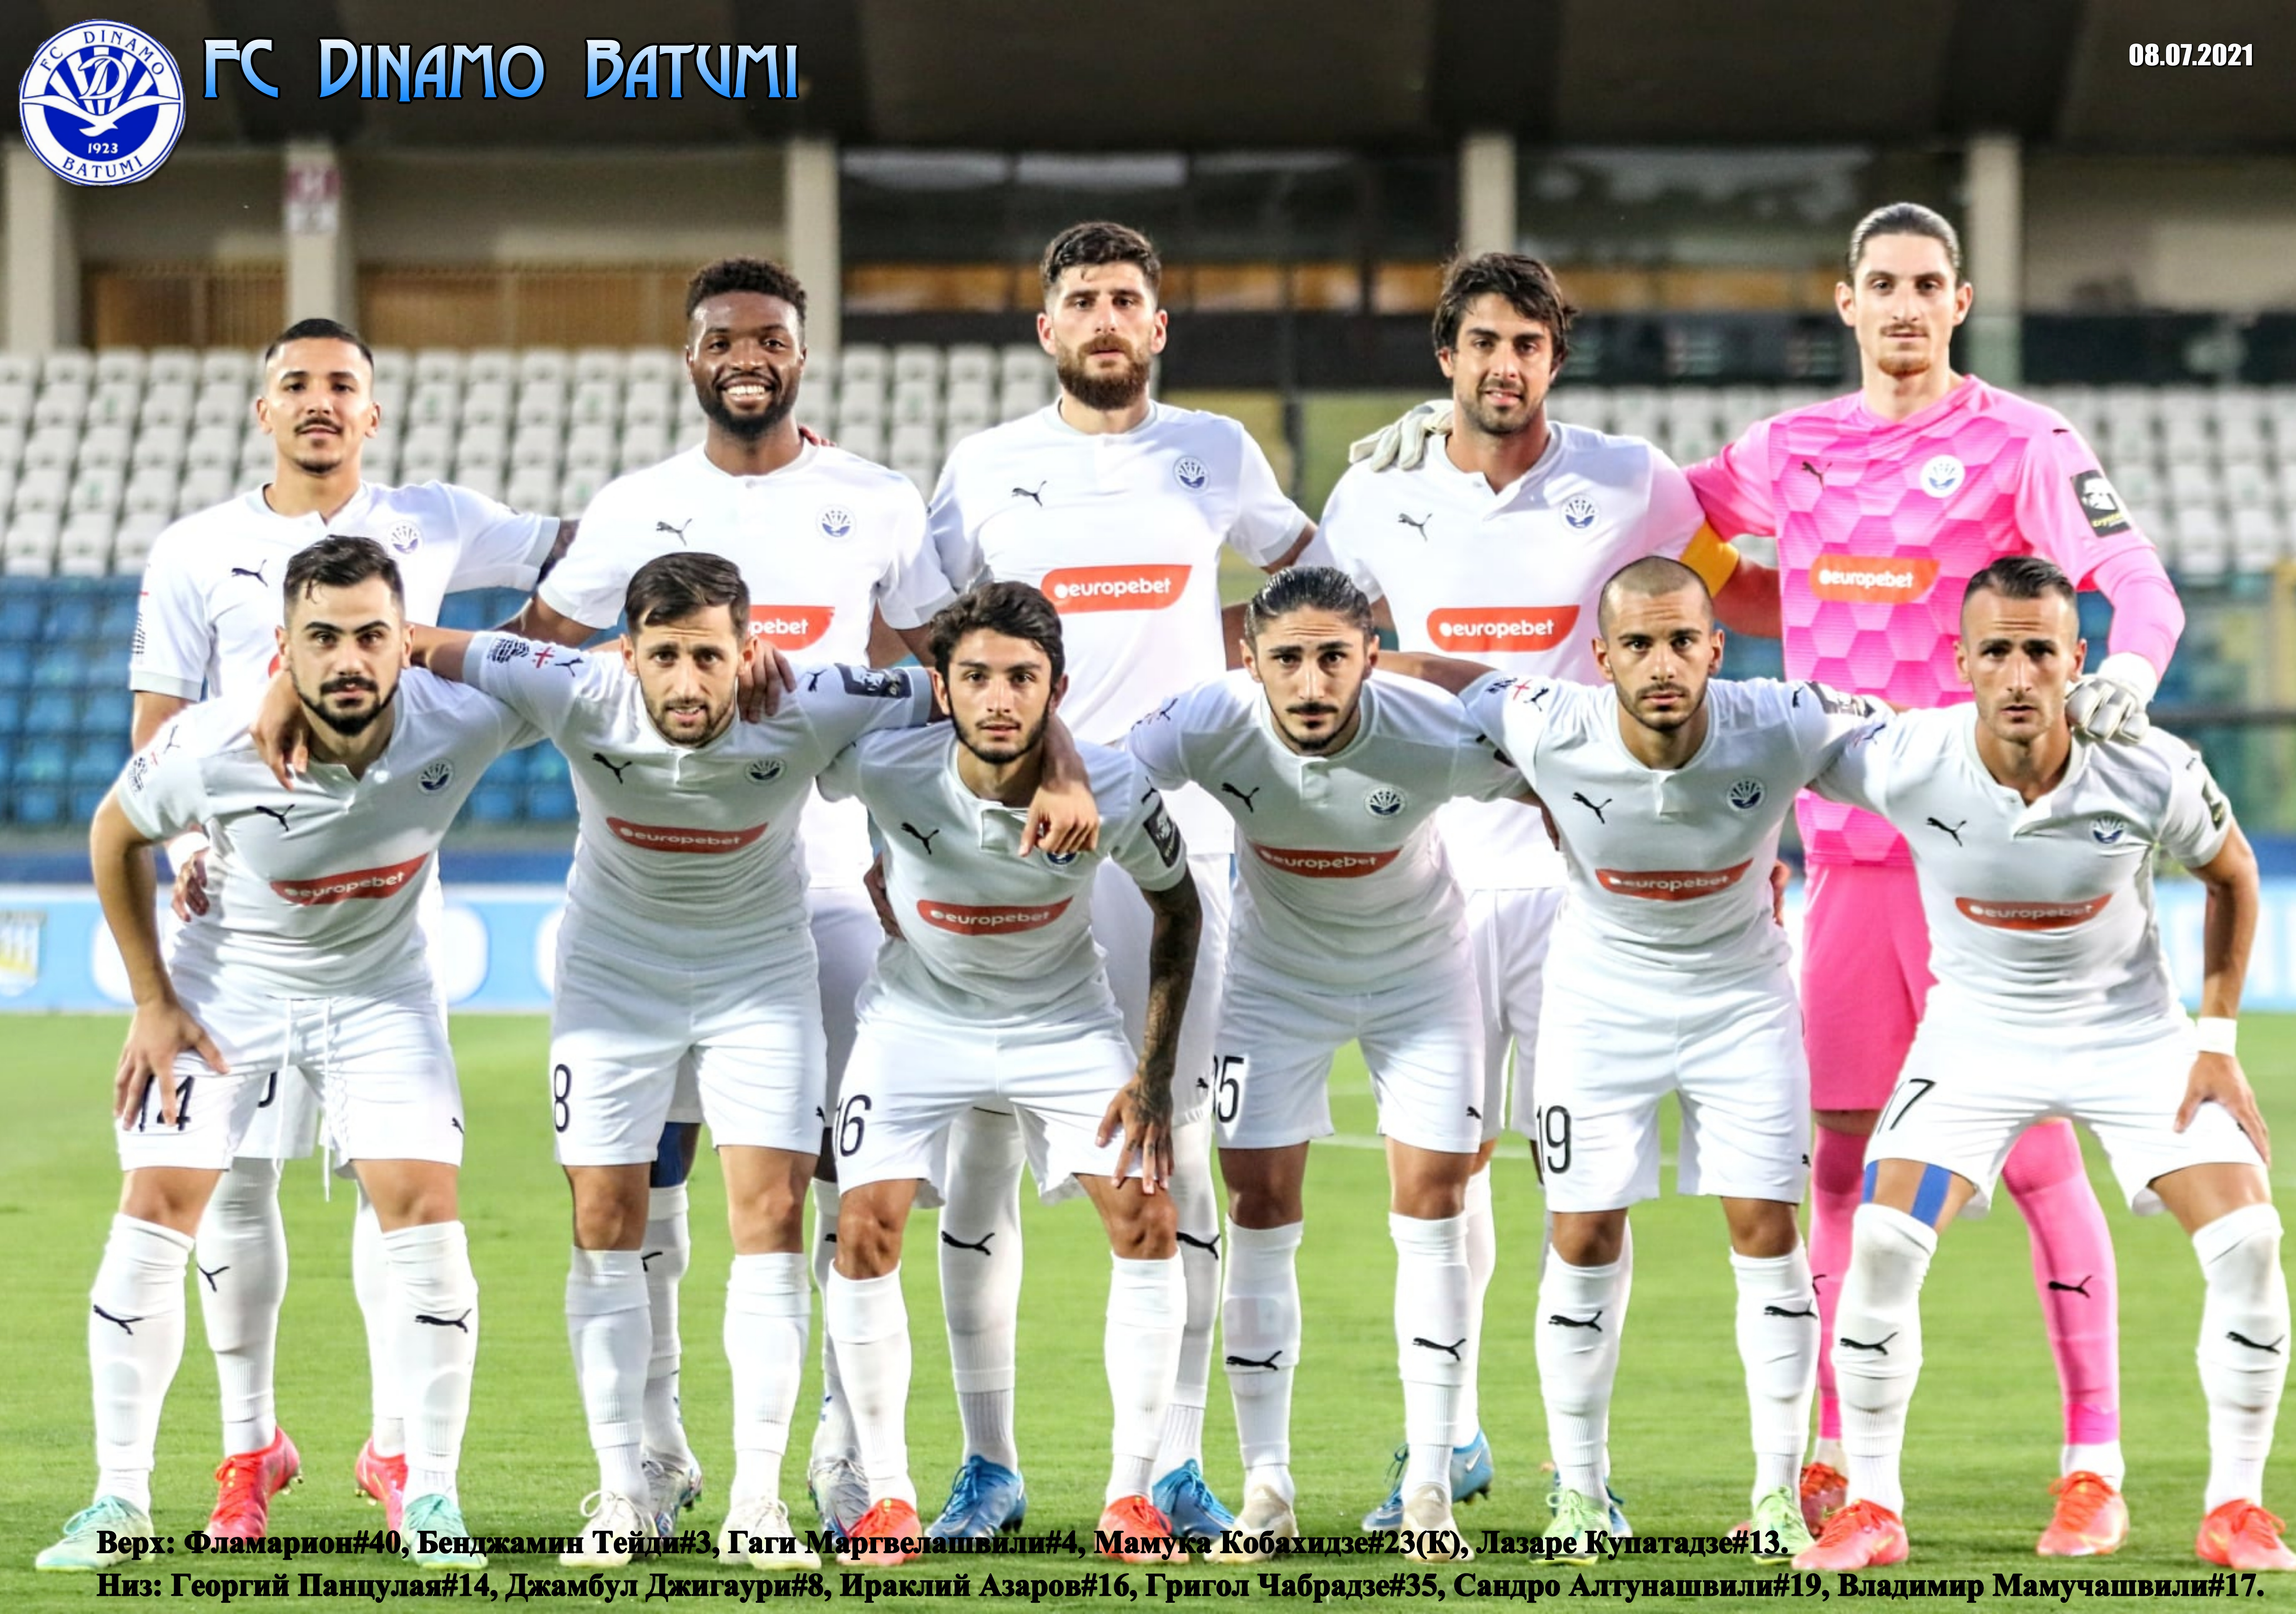 Тре Пенне (Сан-Марино) - Динамо Батуми (Грузия) 0:4